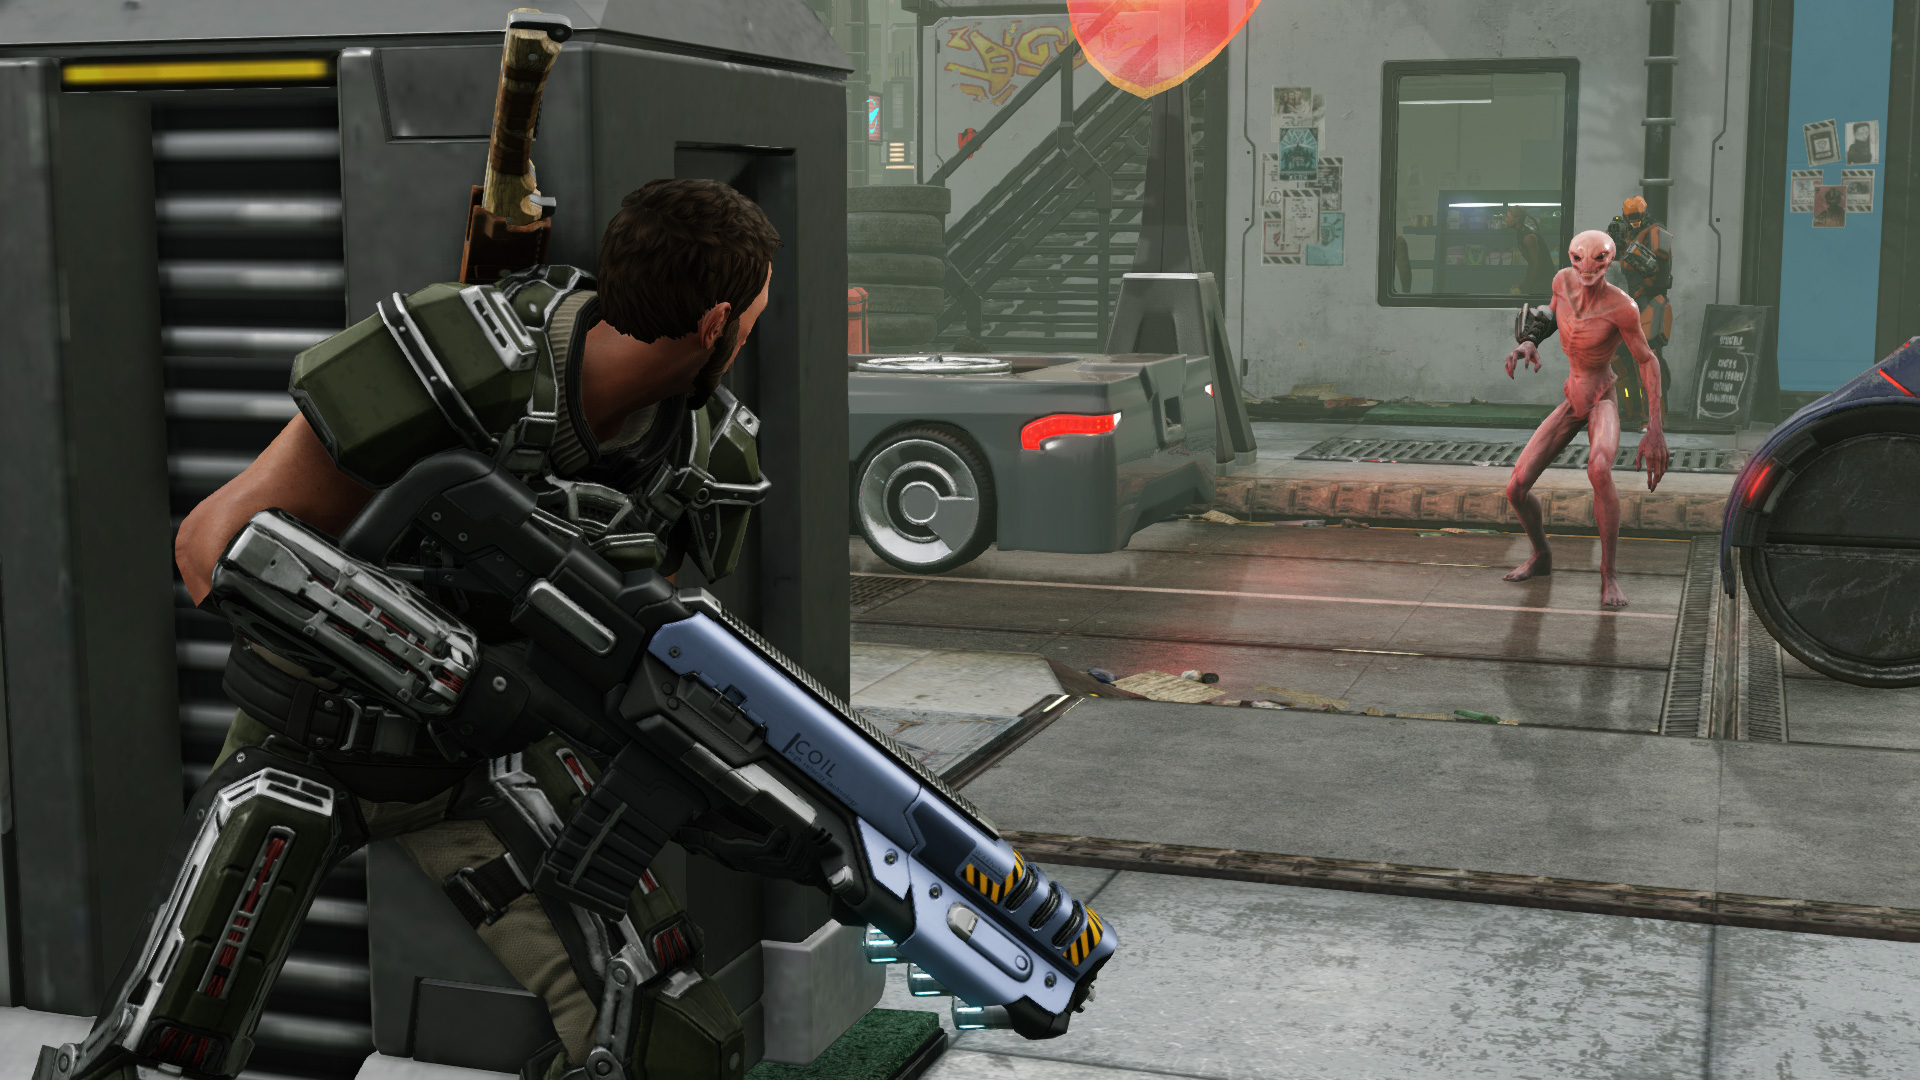 XCOM 2 Long War 2 Total Conversion Mod Now Available